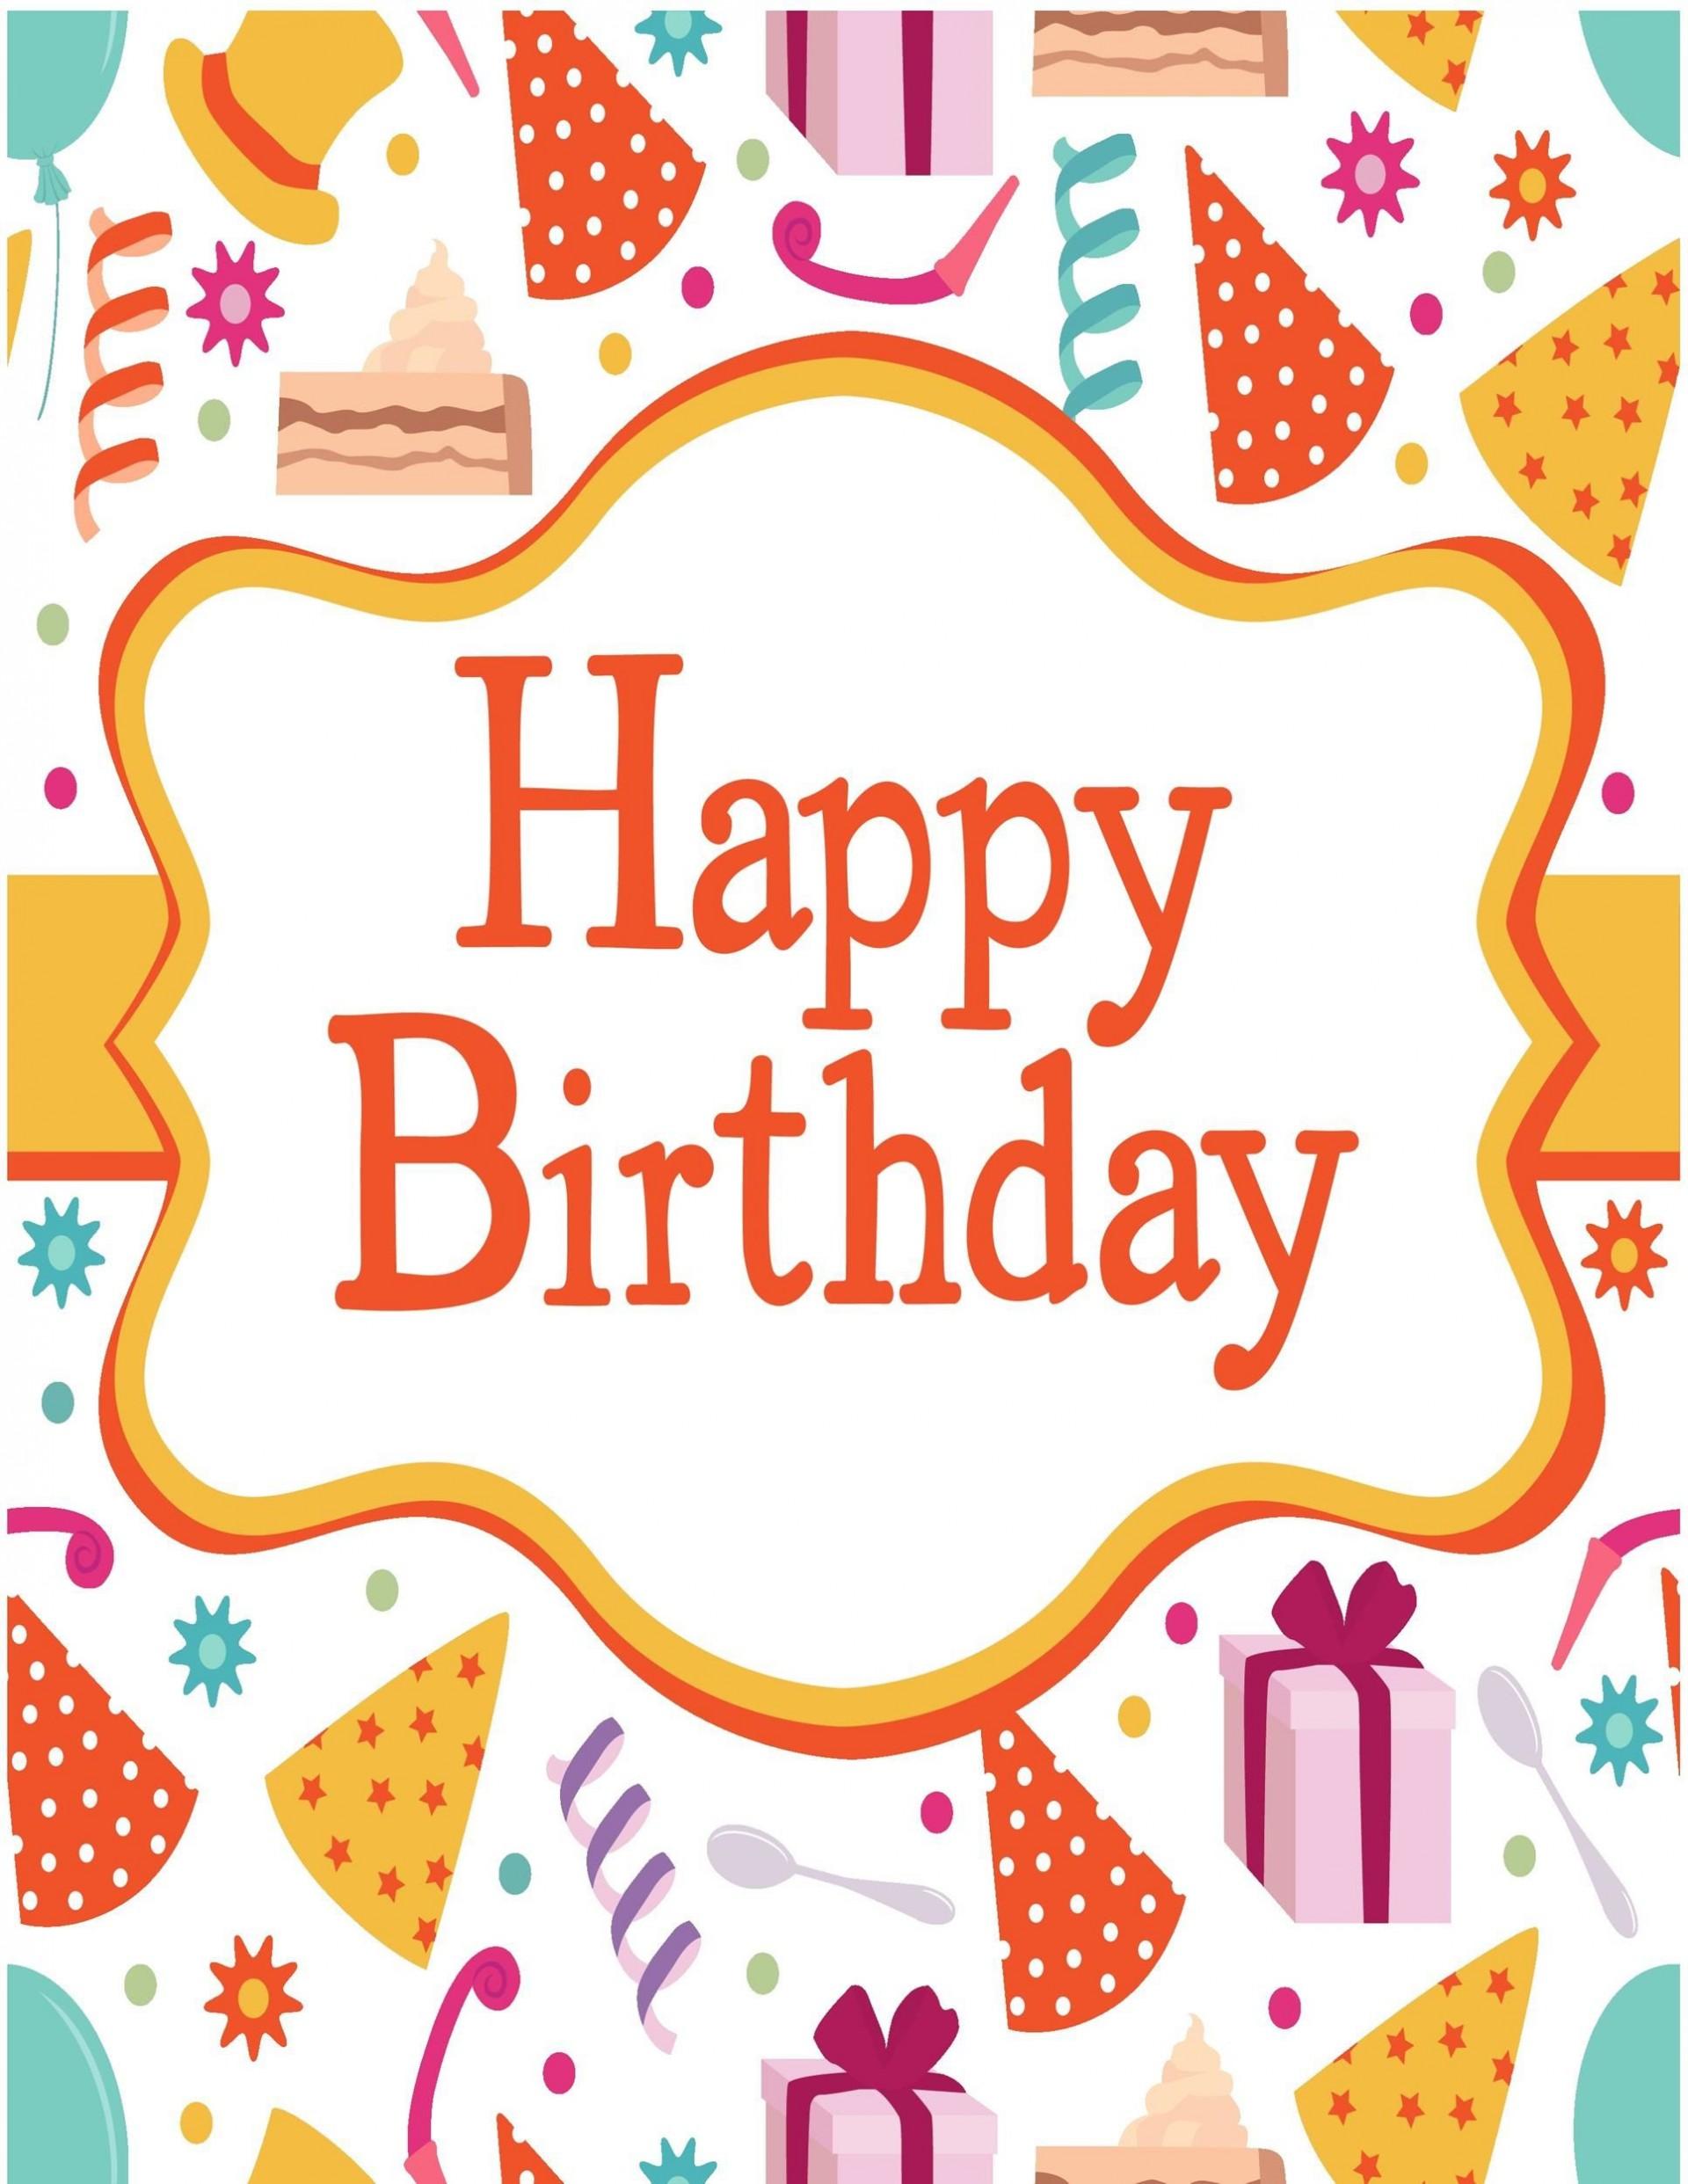 007 Best Birthday Card Template Free Design  Invitation Photoshop Download Word1920